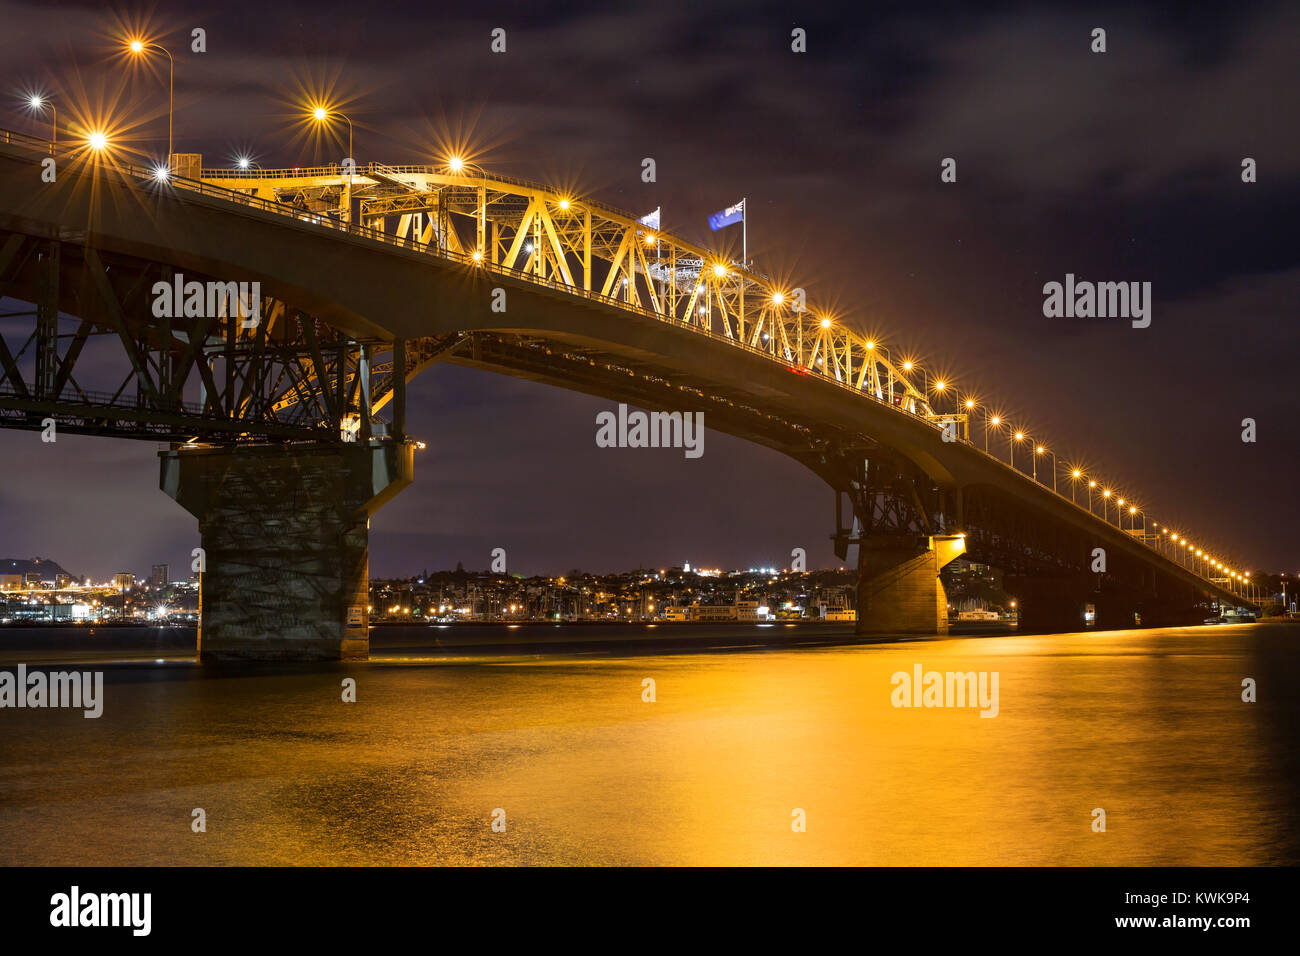 Auckland Harbour Bridge by night, New Zealand - Stock Image